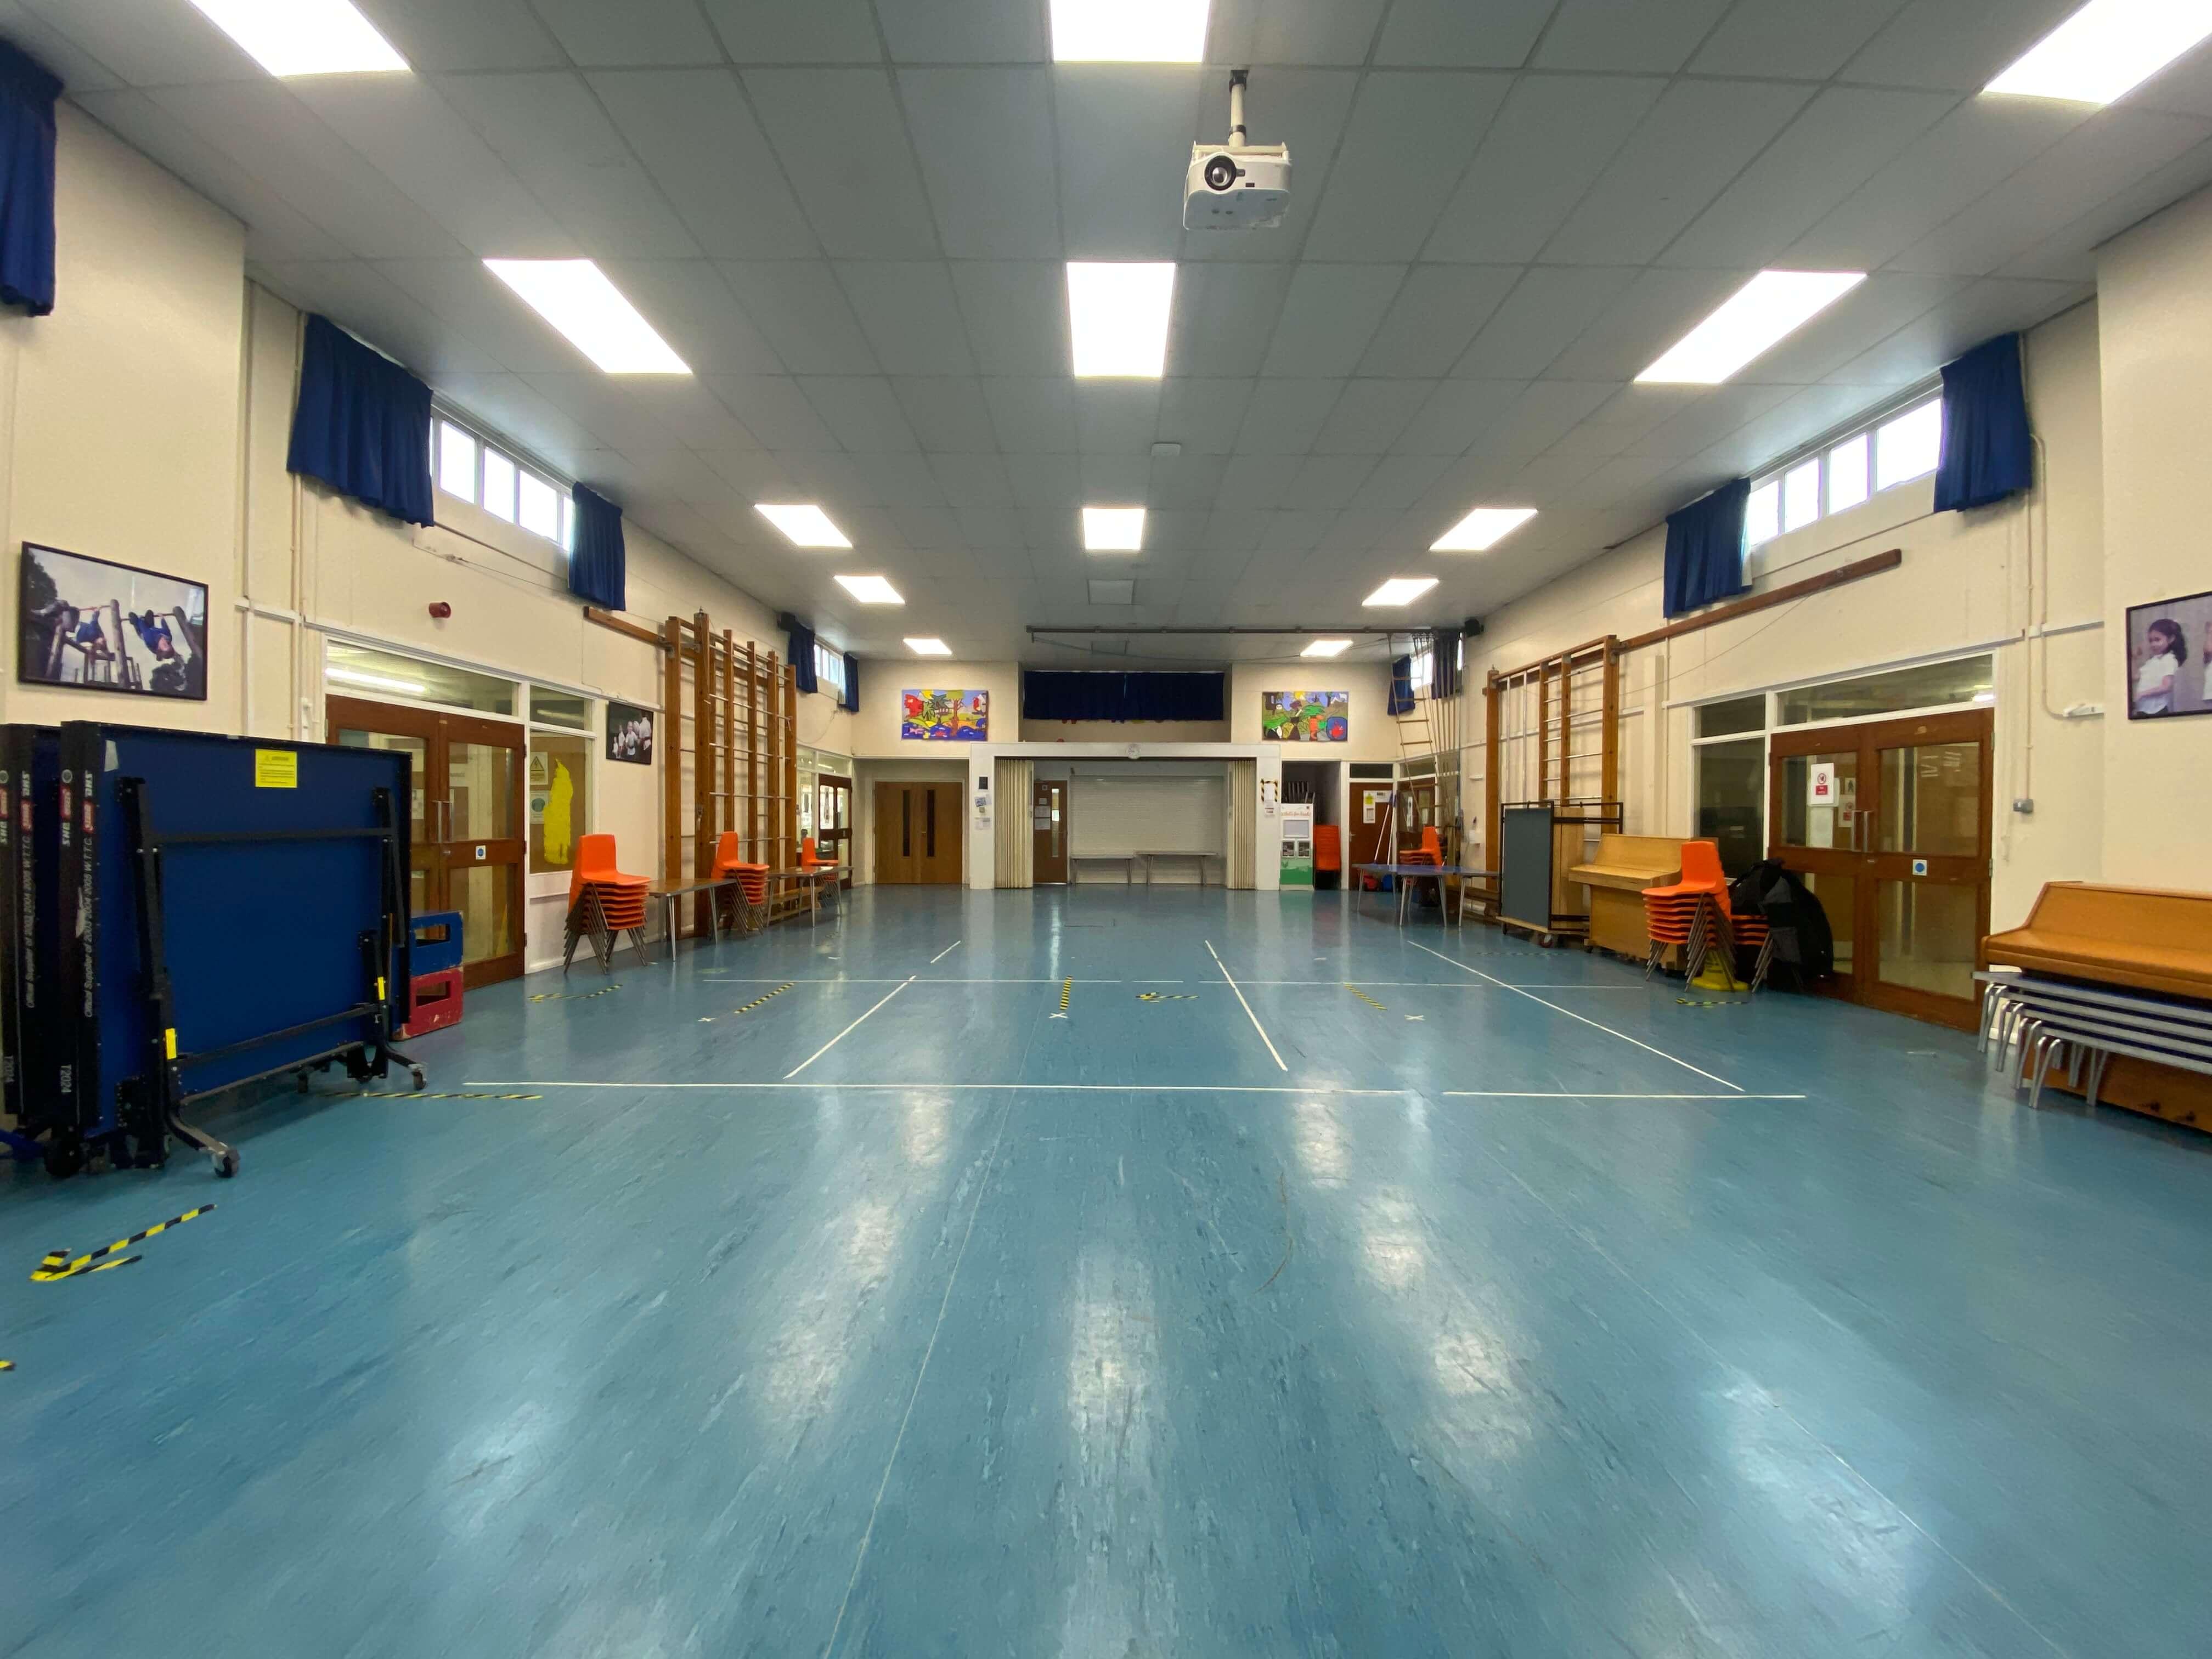 Chalgrove Primary School Main Hall